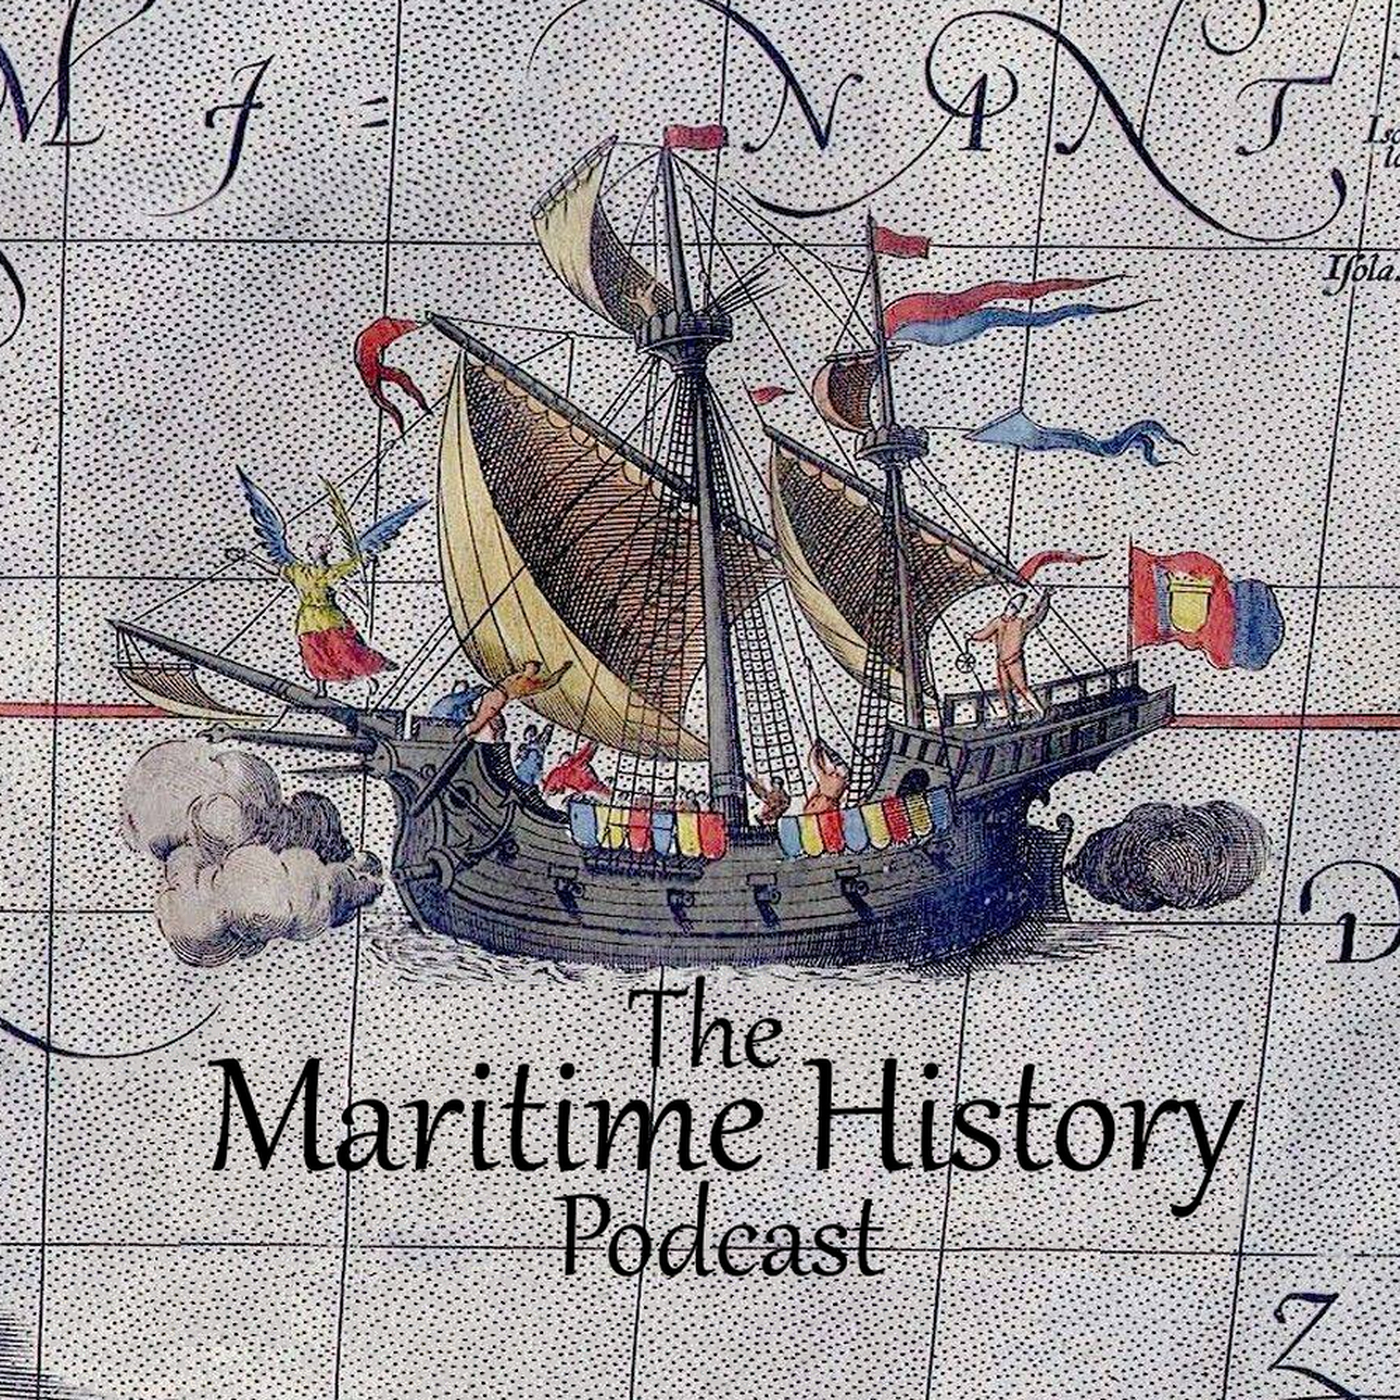 026 - Sailing Advice from Hesiod, the Farmer-Poet